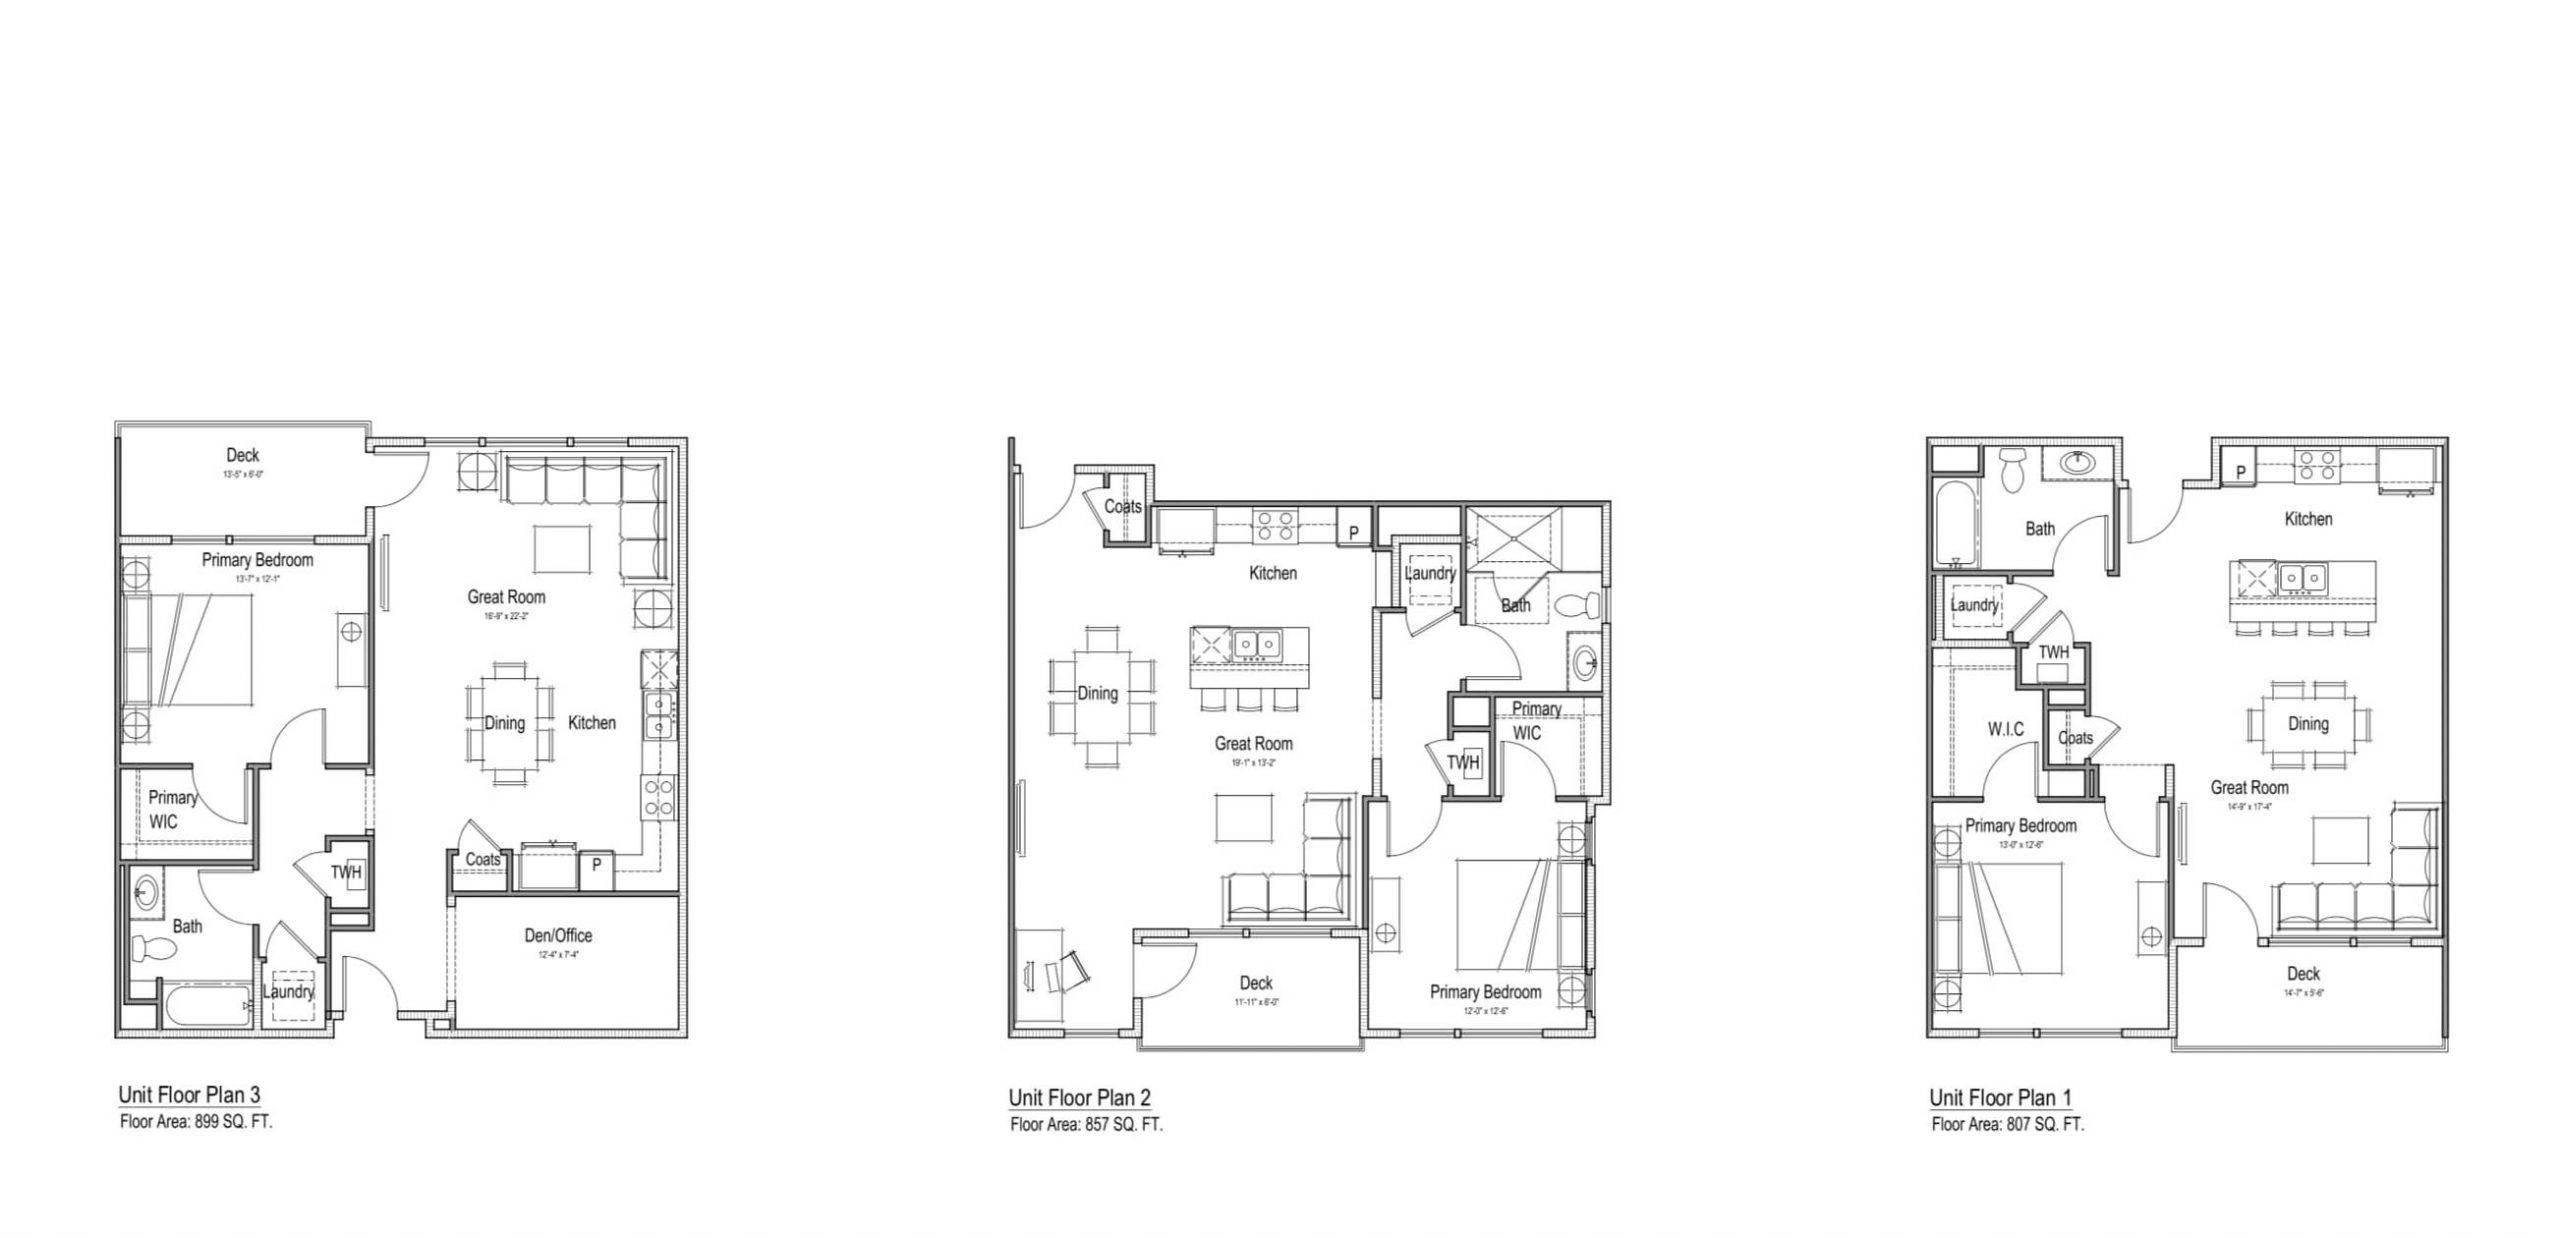 2400 Adeline Street Unit Floor Plans